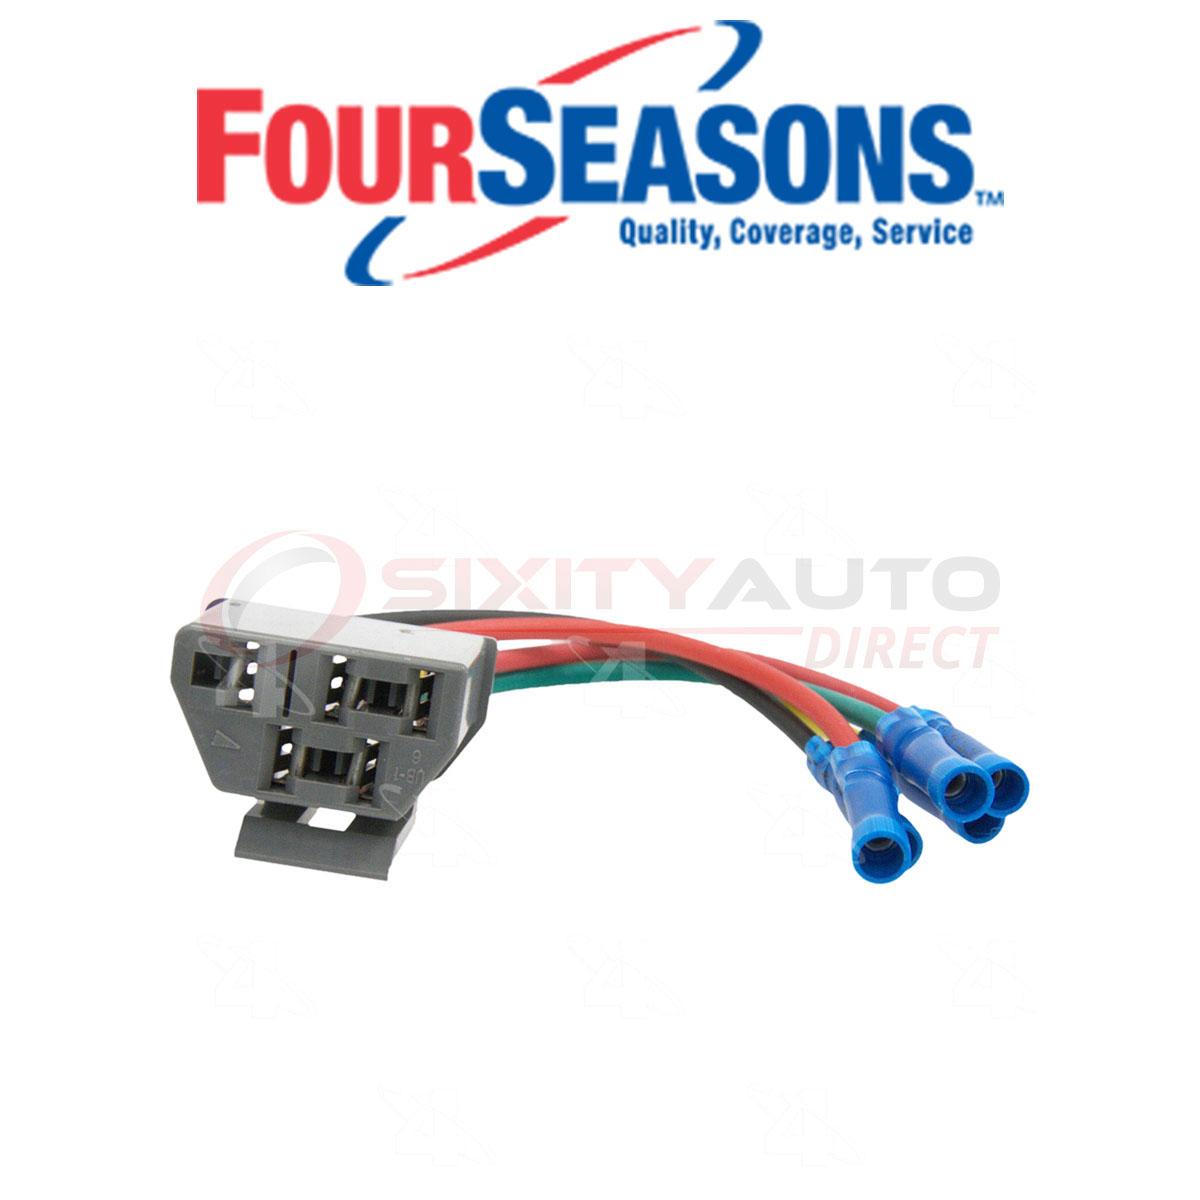 yy Four Seasons HVAC Mode Door Actuator for 2000-2005 Cadillac DeVille